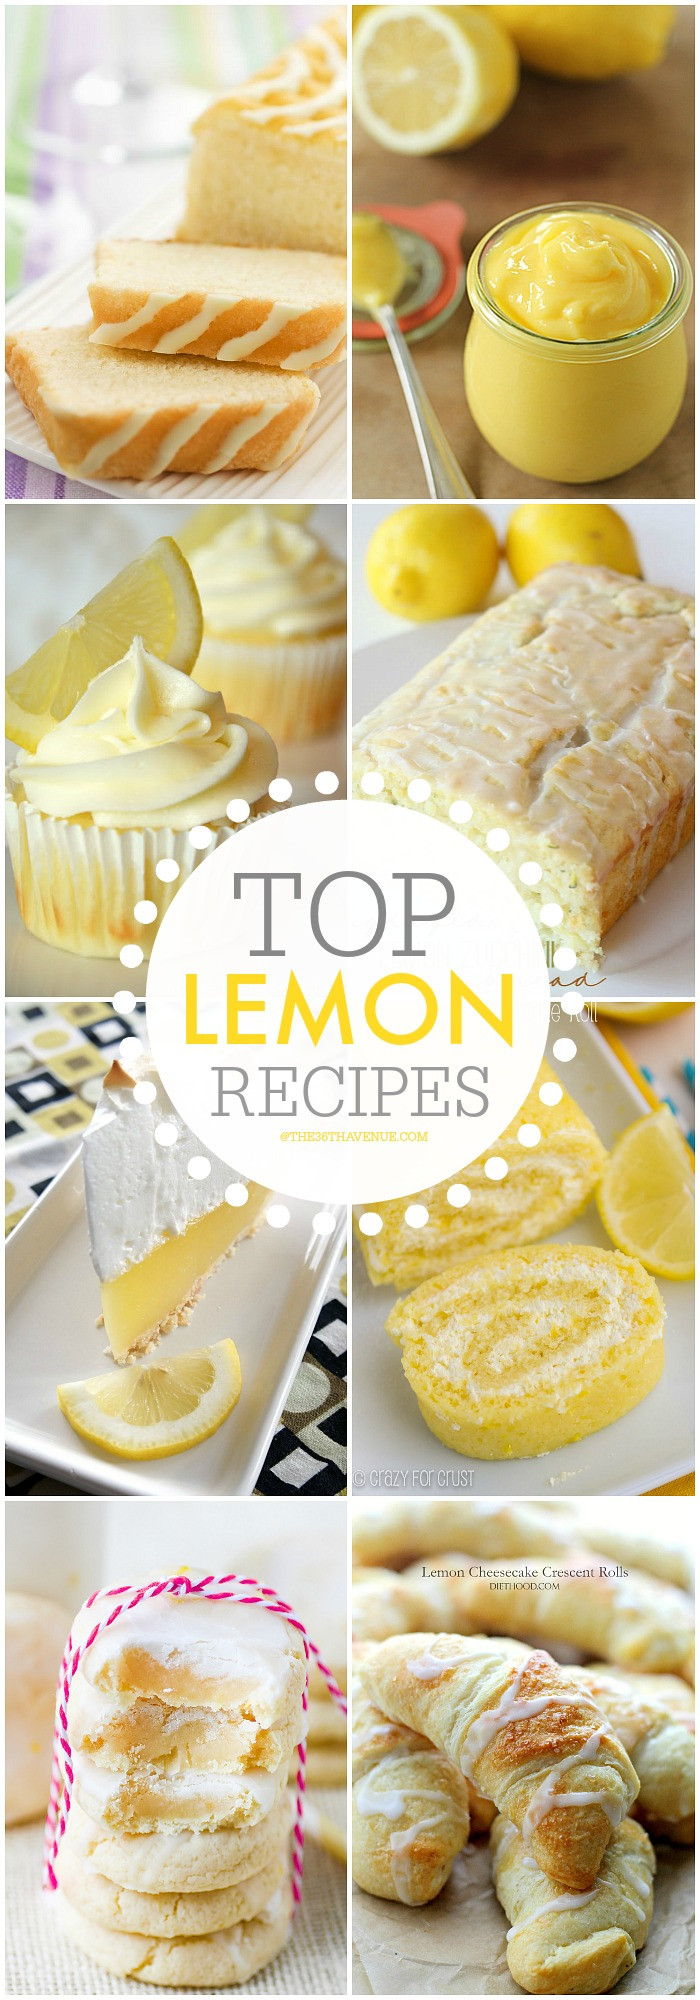 Lemon Desserts Recipes  Best Lemon Dessert Recipes The 36th AVENUE